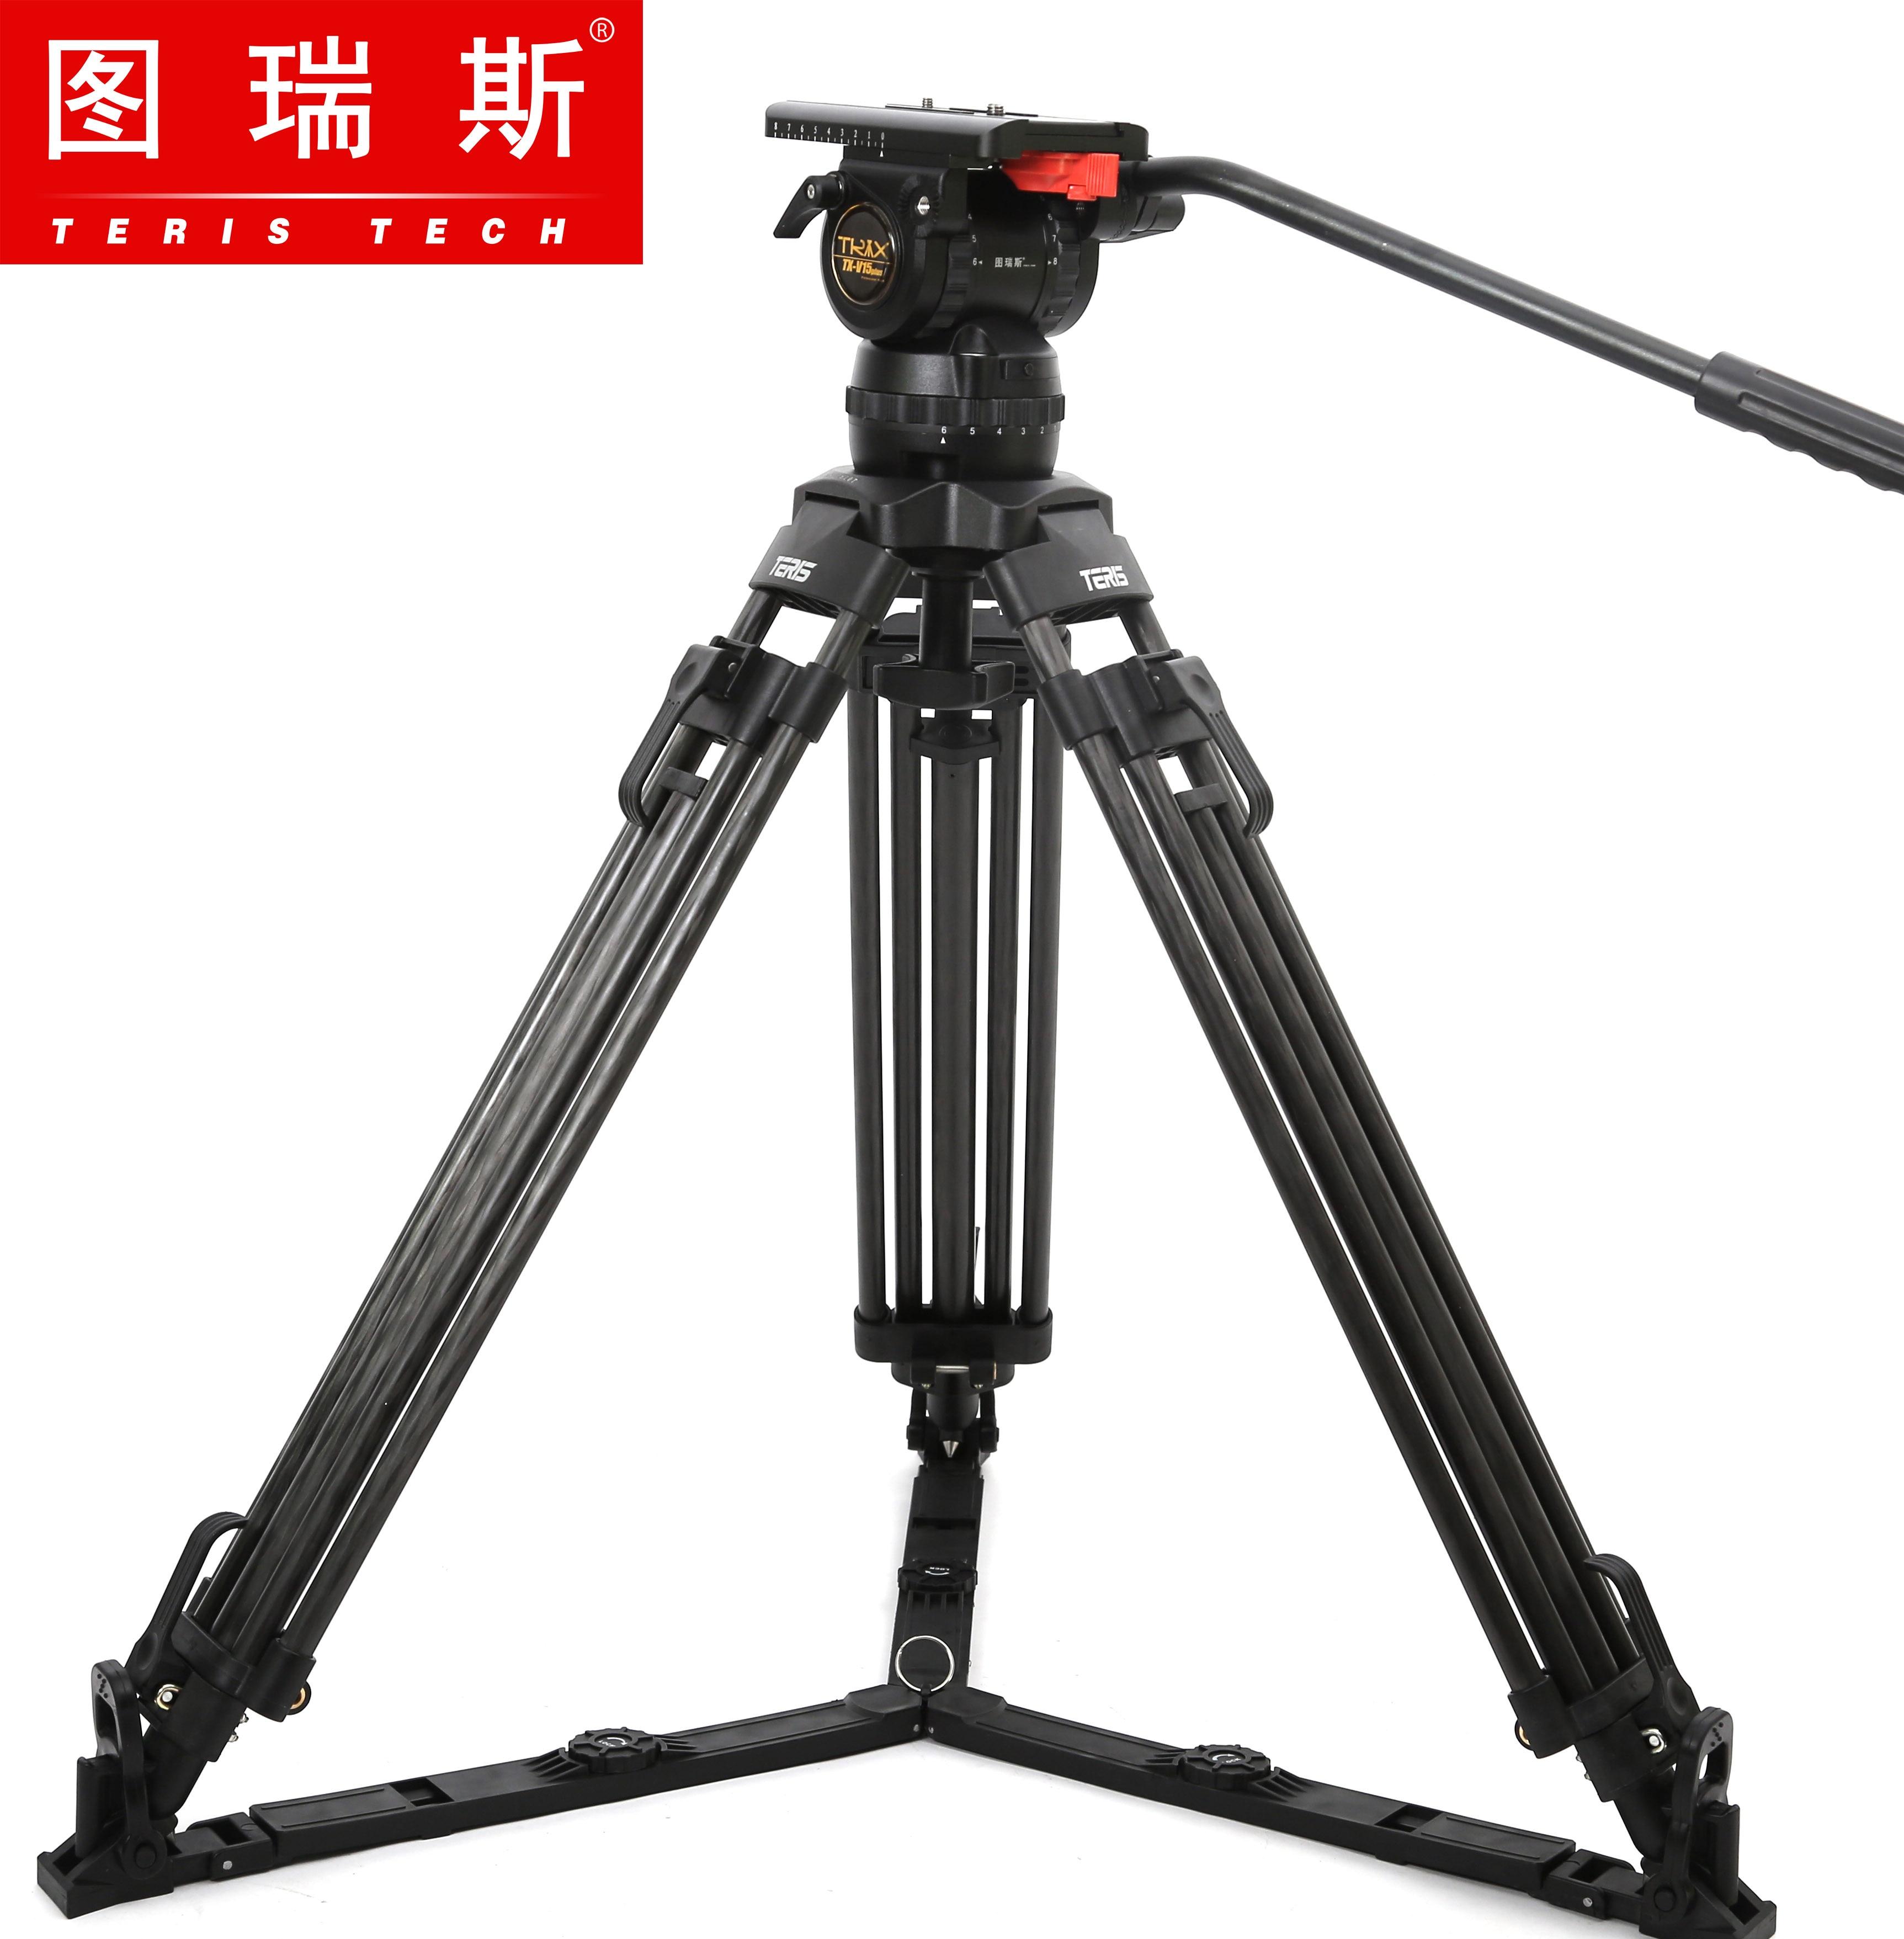 TERIS TX V15L Plus ขาตั้งกล้อง Professional อลูมิเนียม 100 มม.ขาตั้งกล้องหัวโหลด 15 กก.สำหรับ TILTA สีแดง DSMC2 กล้องกรง-ใน ขาตั้งกล้องถ่ายทอดสด จาก อุปกรณ์อิเล็กทรอนิกส์ บน AliExpress - 11.11_สิบเอ็ด สิบเอ็ดวันคนโสด 2